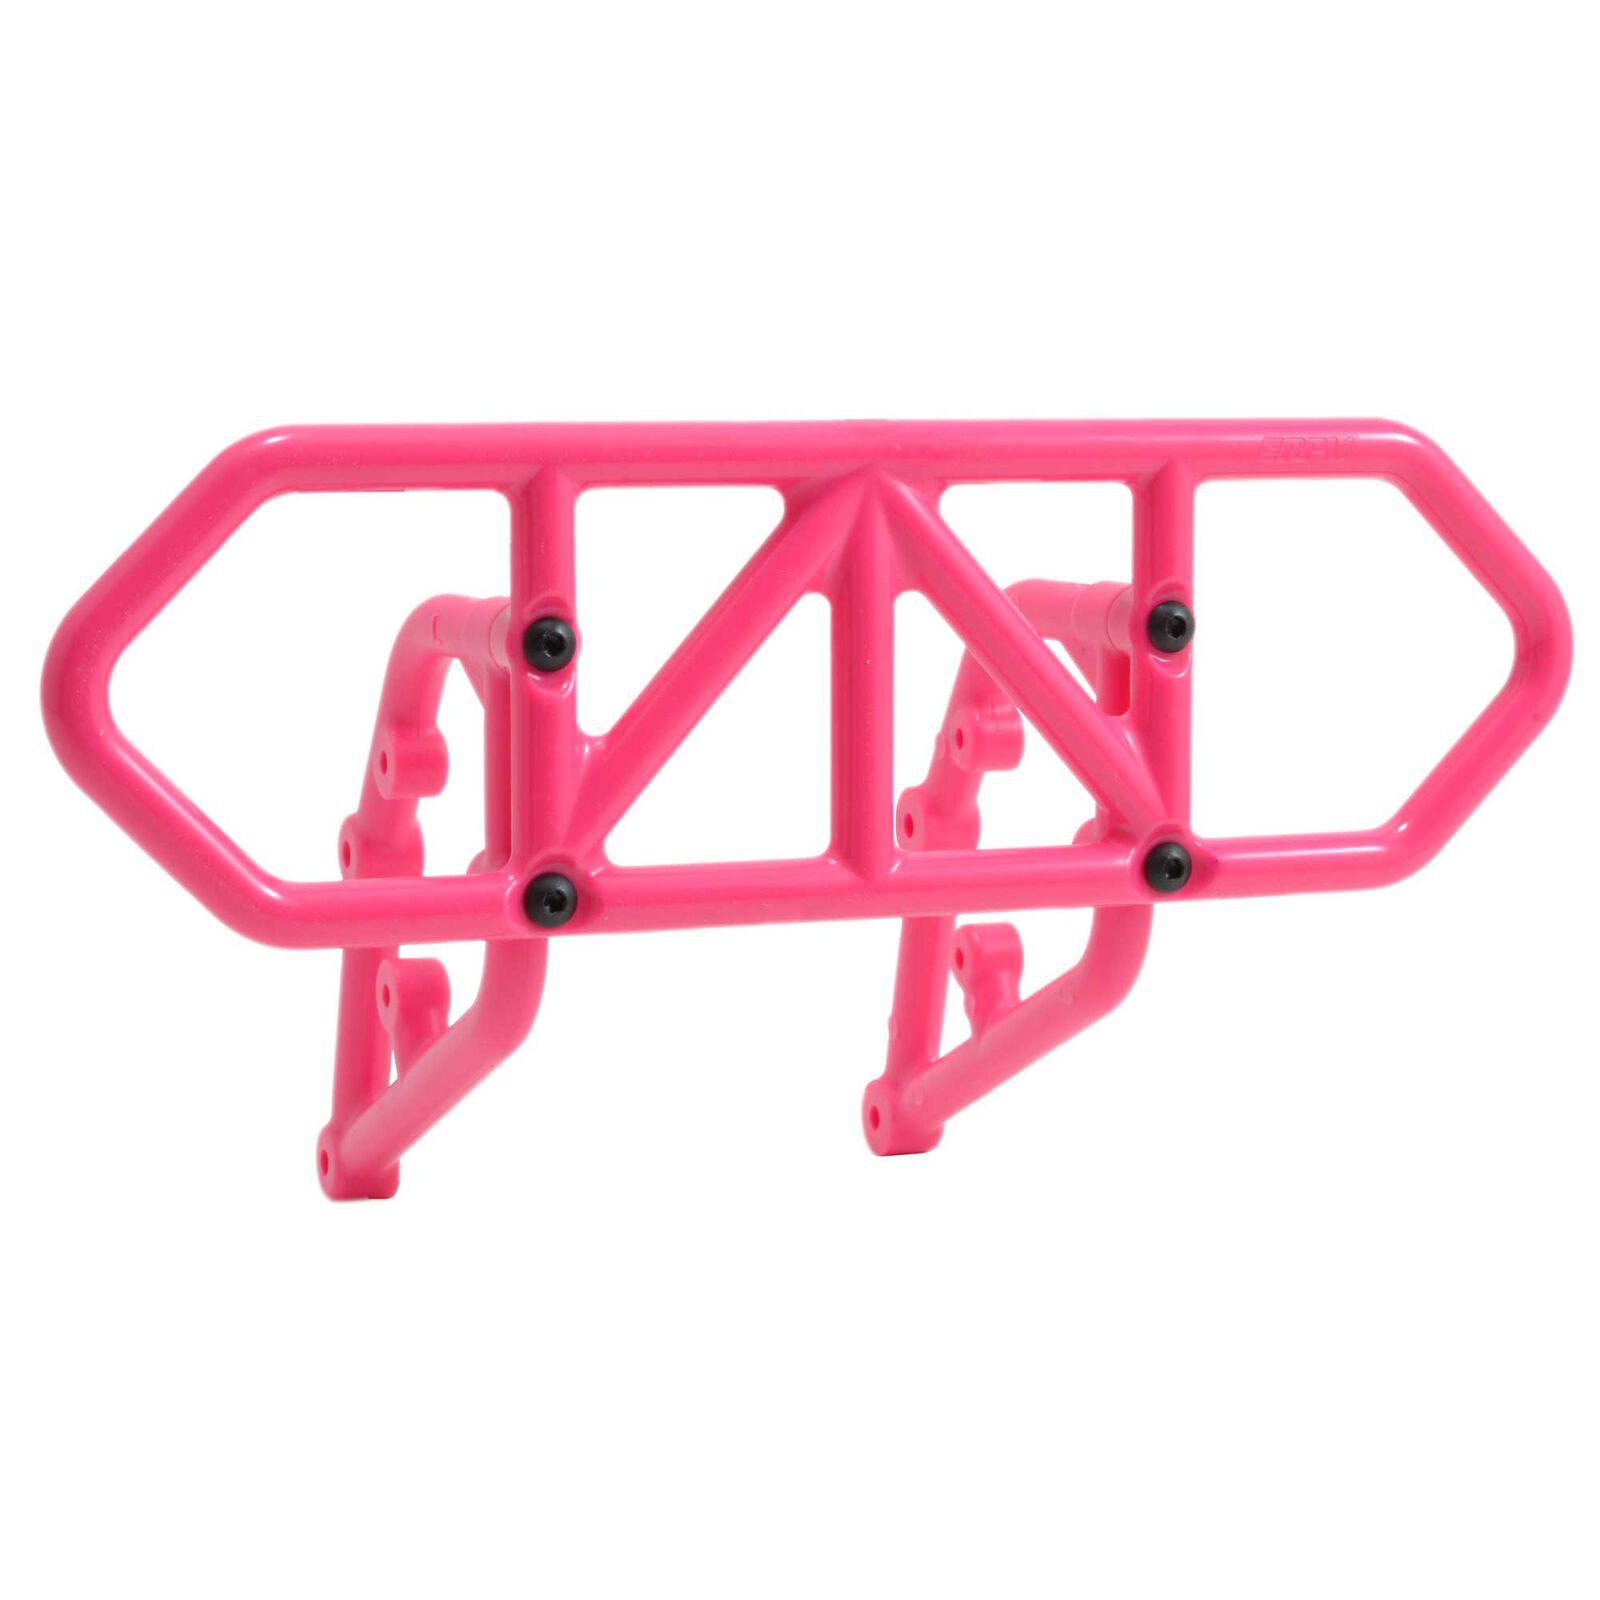 Rear Bumper Pink: Slash 2WD